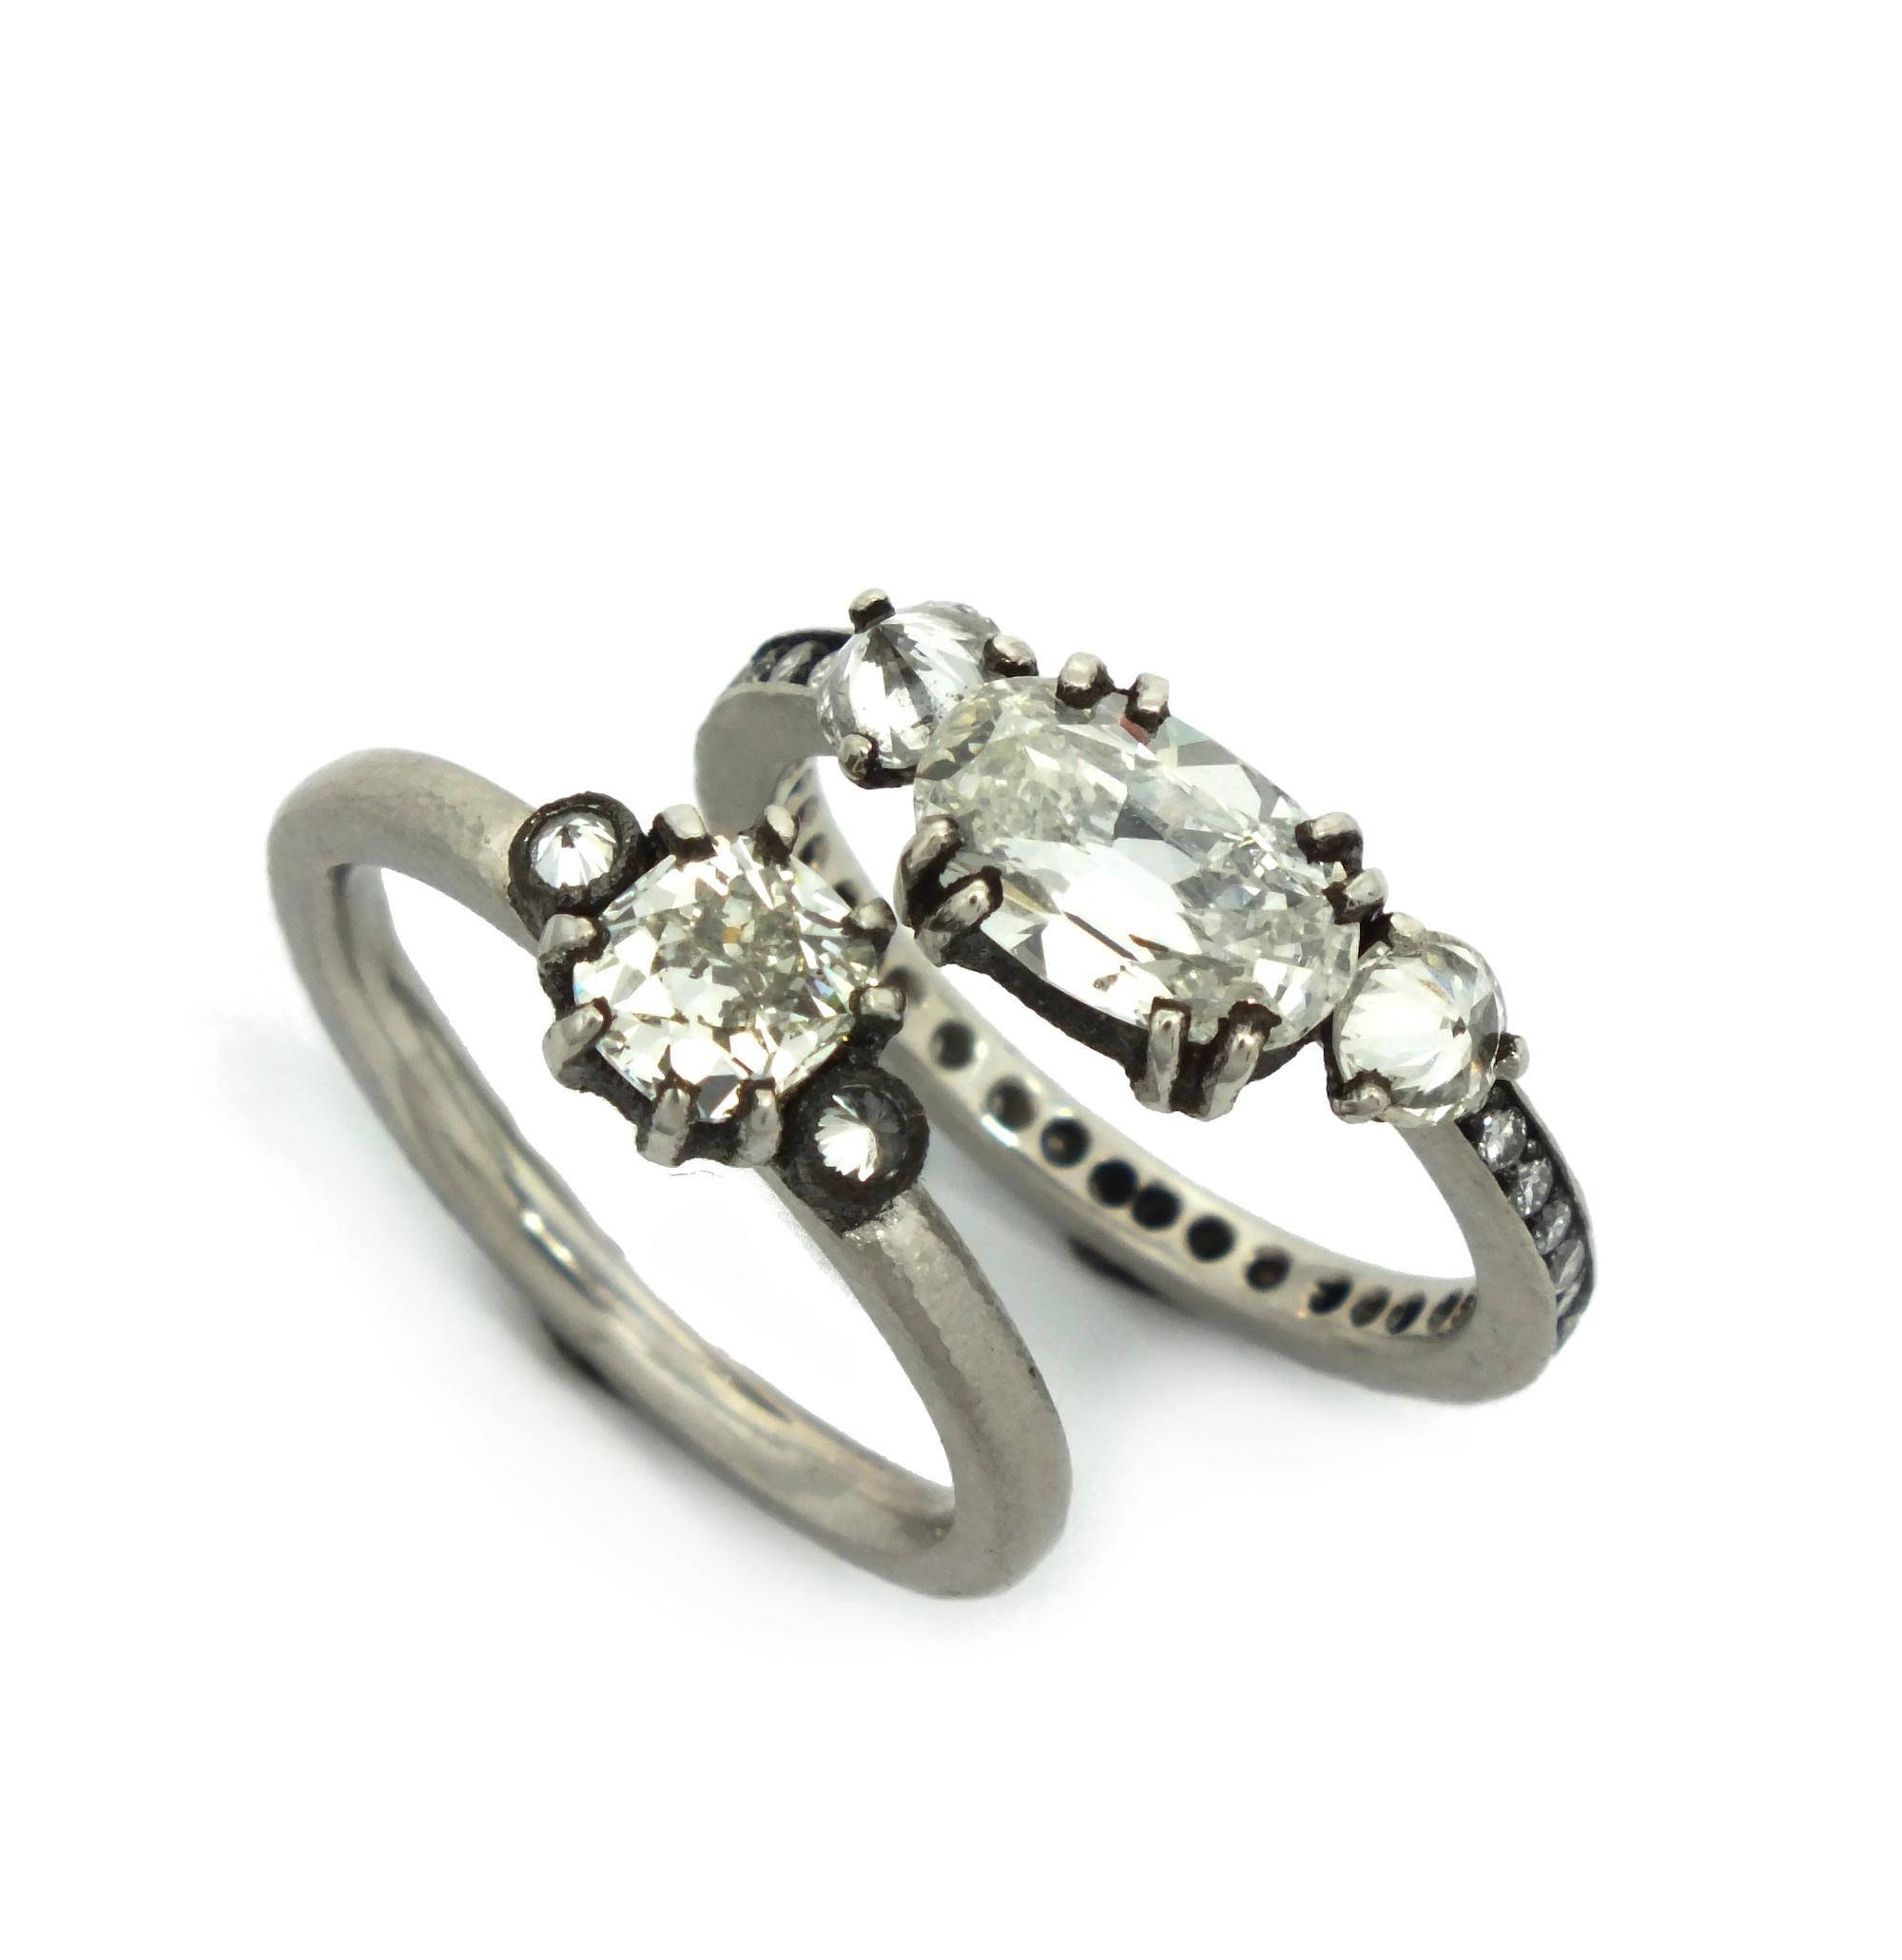 TAP.ring.R256.r257.JPG